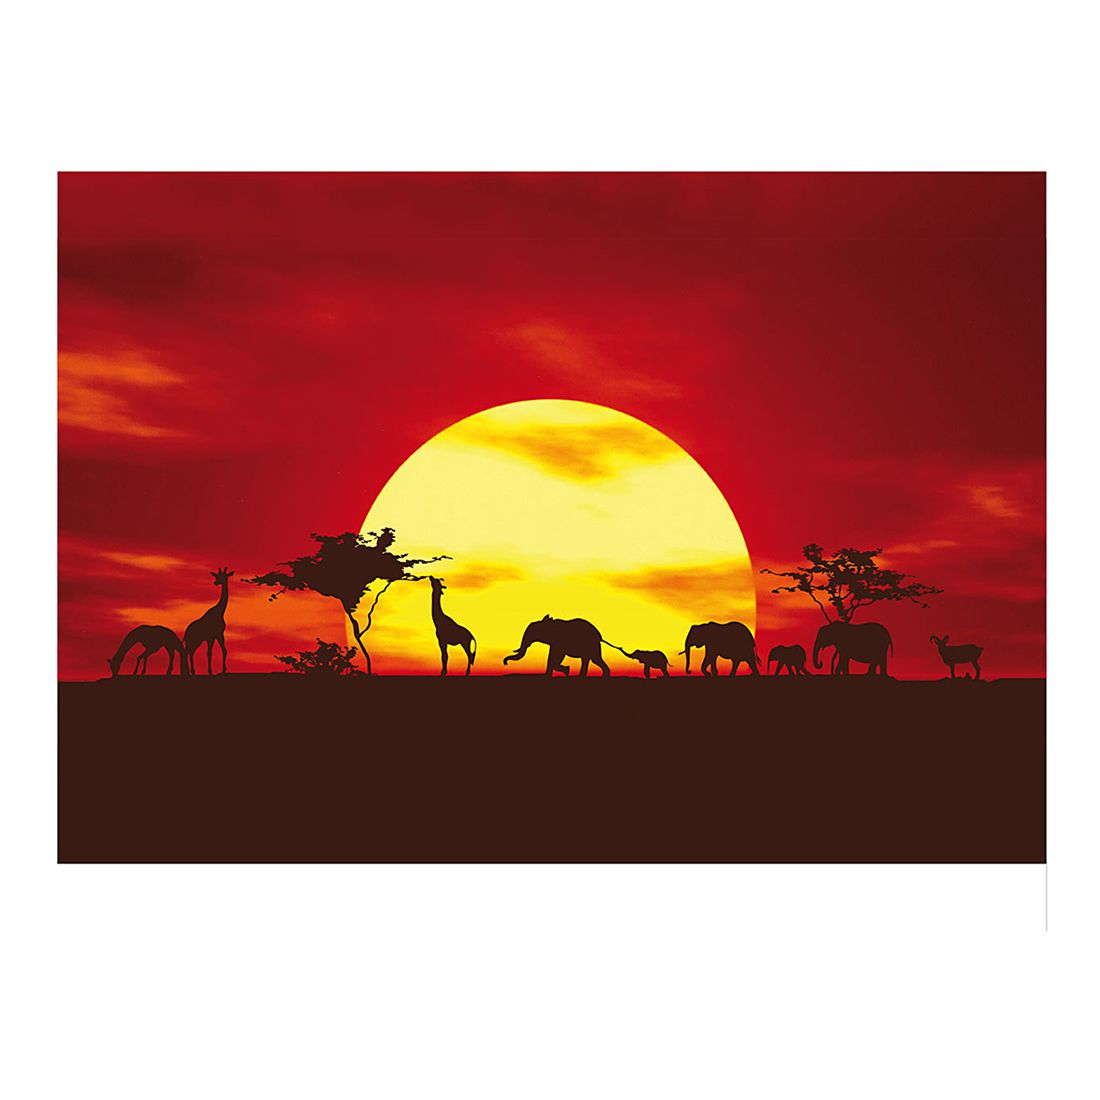 Fototapete African Caravan, Mantiburi günstig